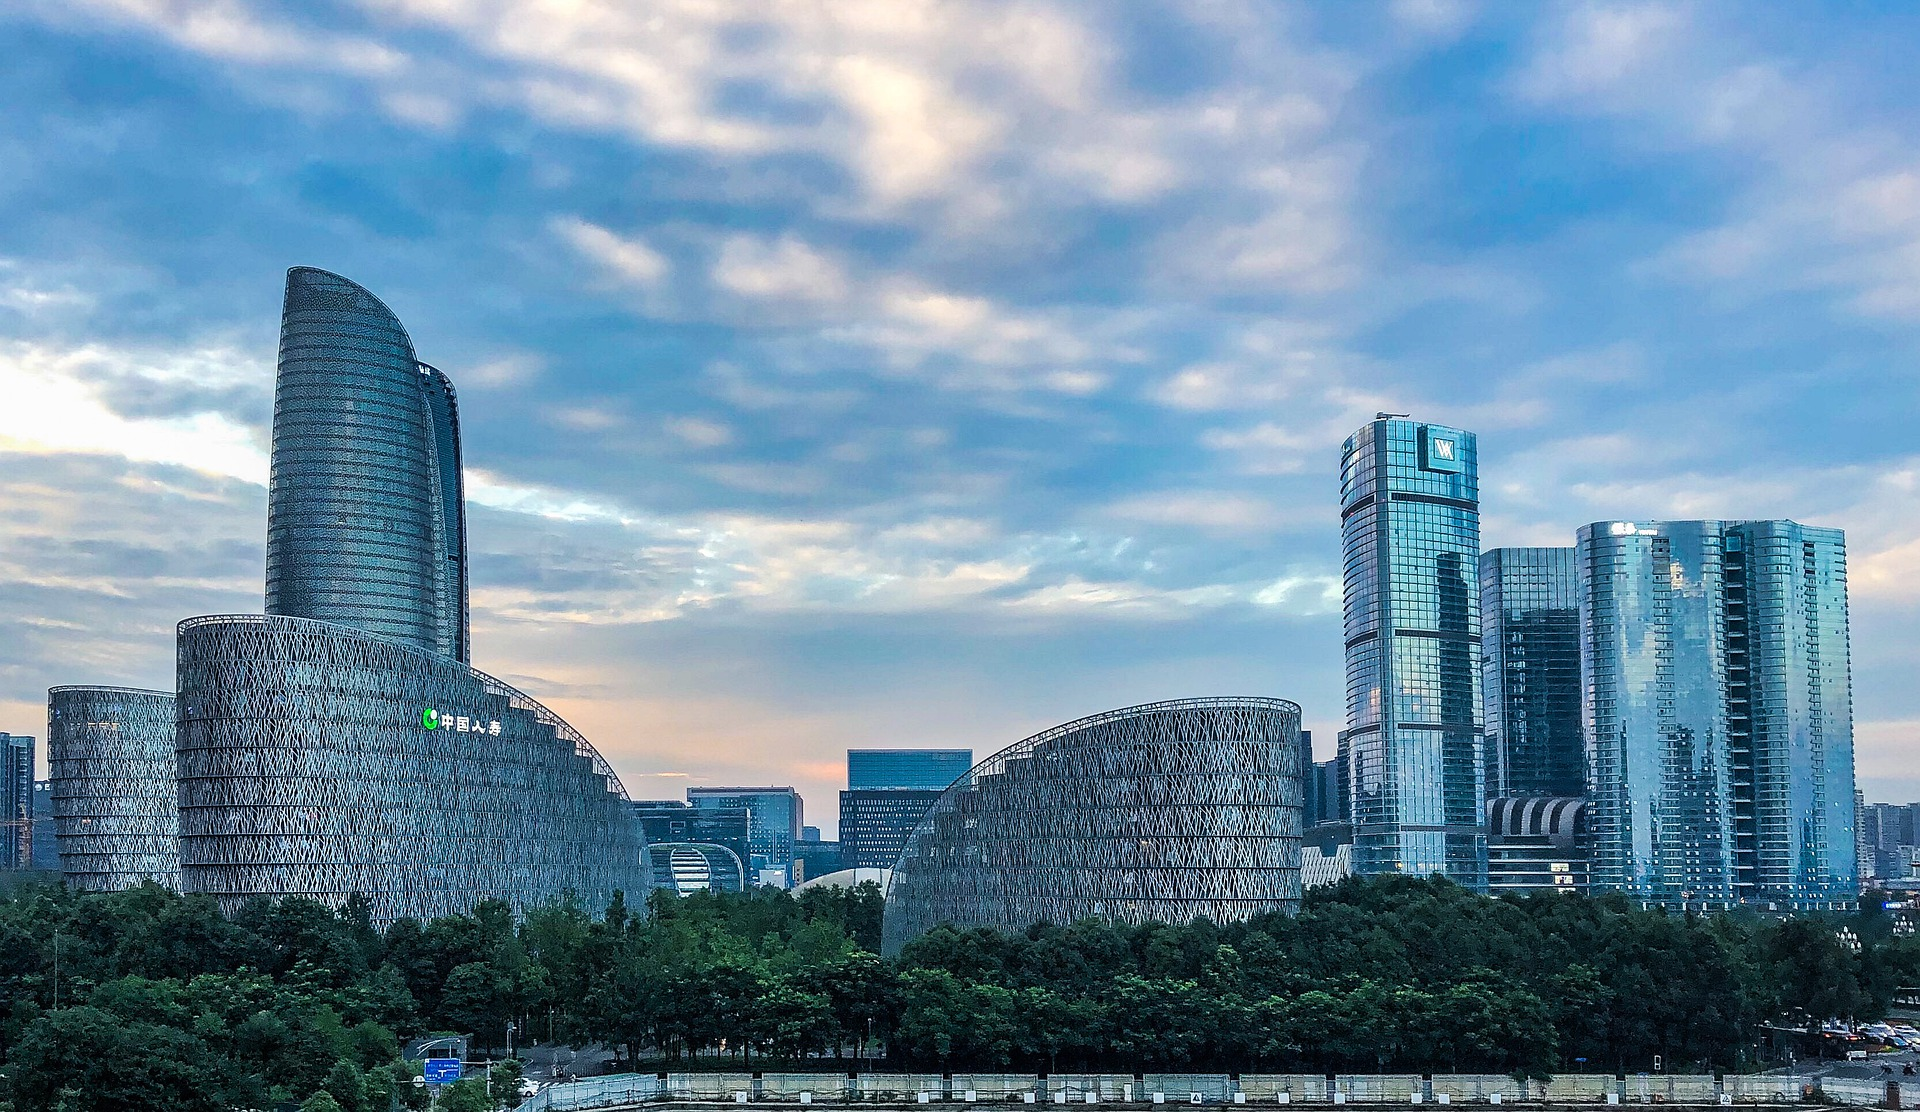 TastyWines Online – Chengdu